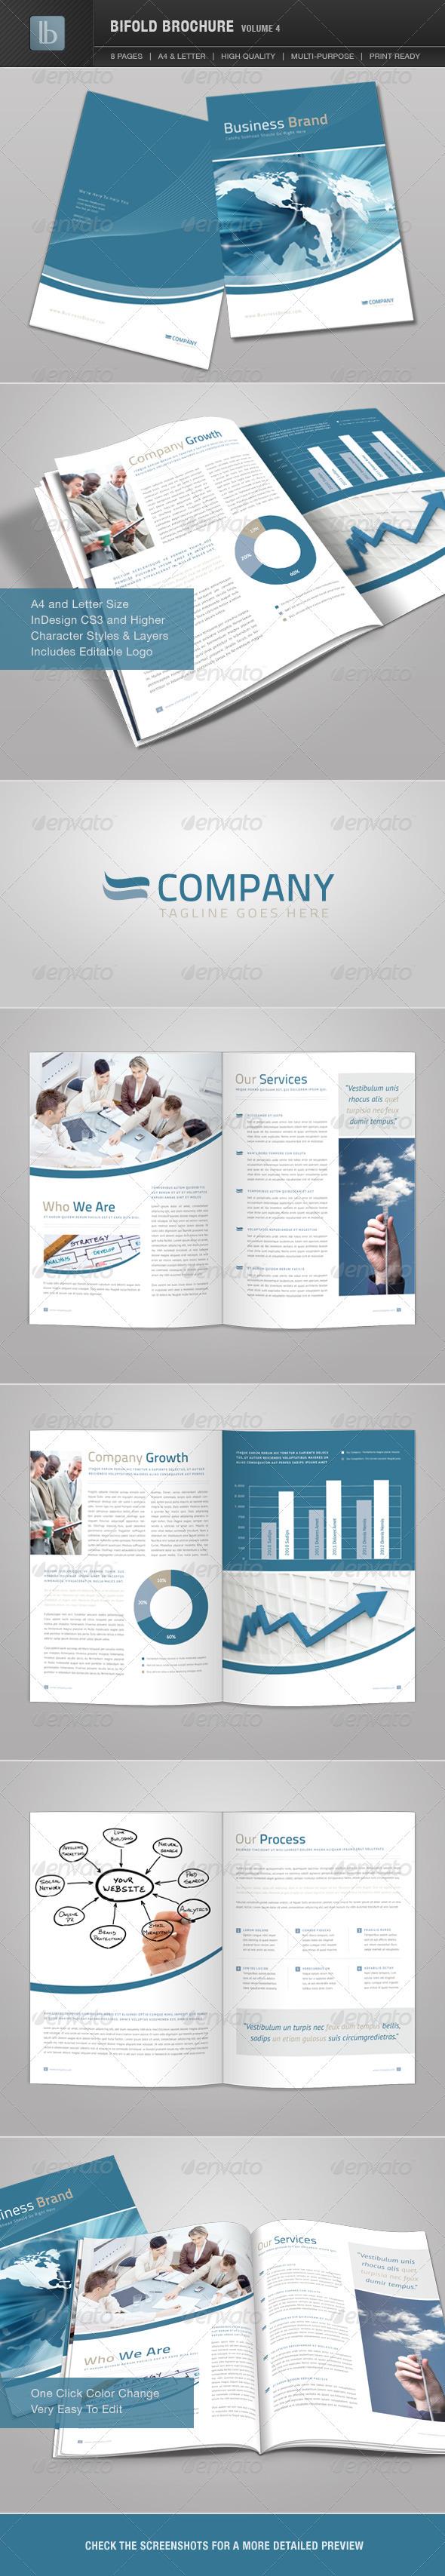 GraphicRiver Bifold Brochure Volume 4 1586607